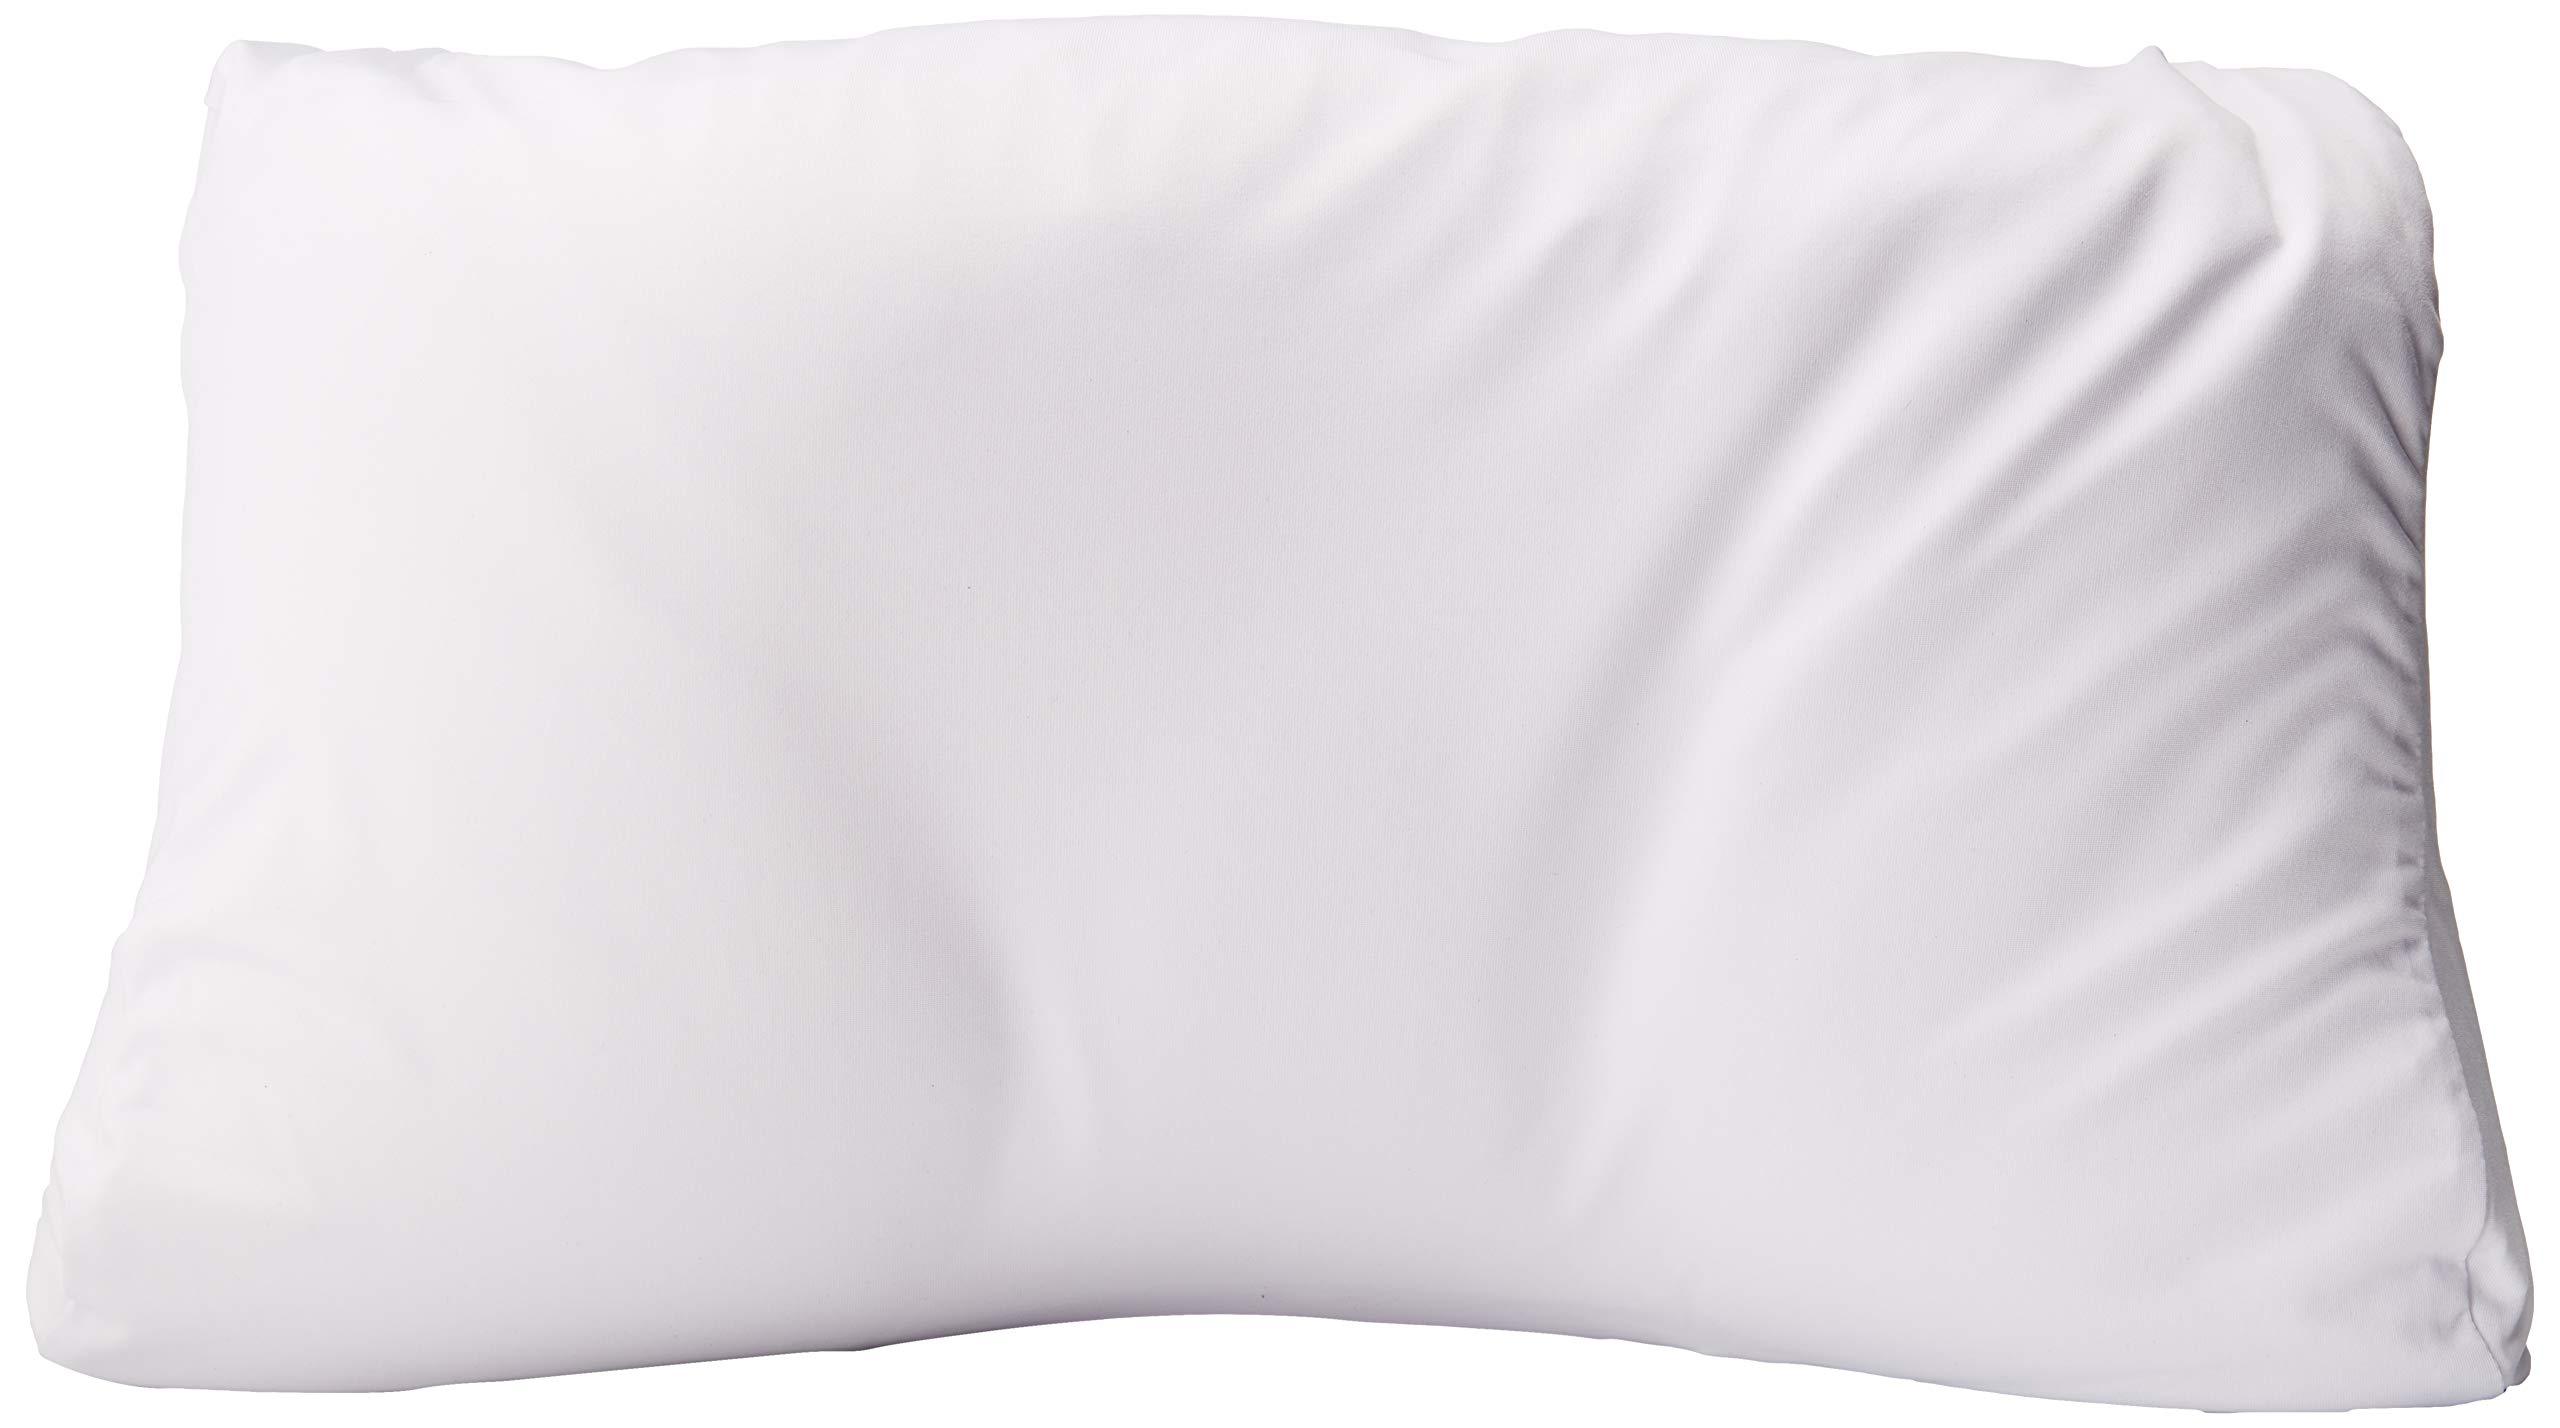 Sobakawa Cloud Pillow 12.6″ x 18.5″ x 3.15″